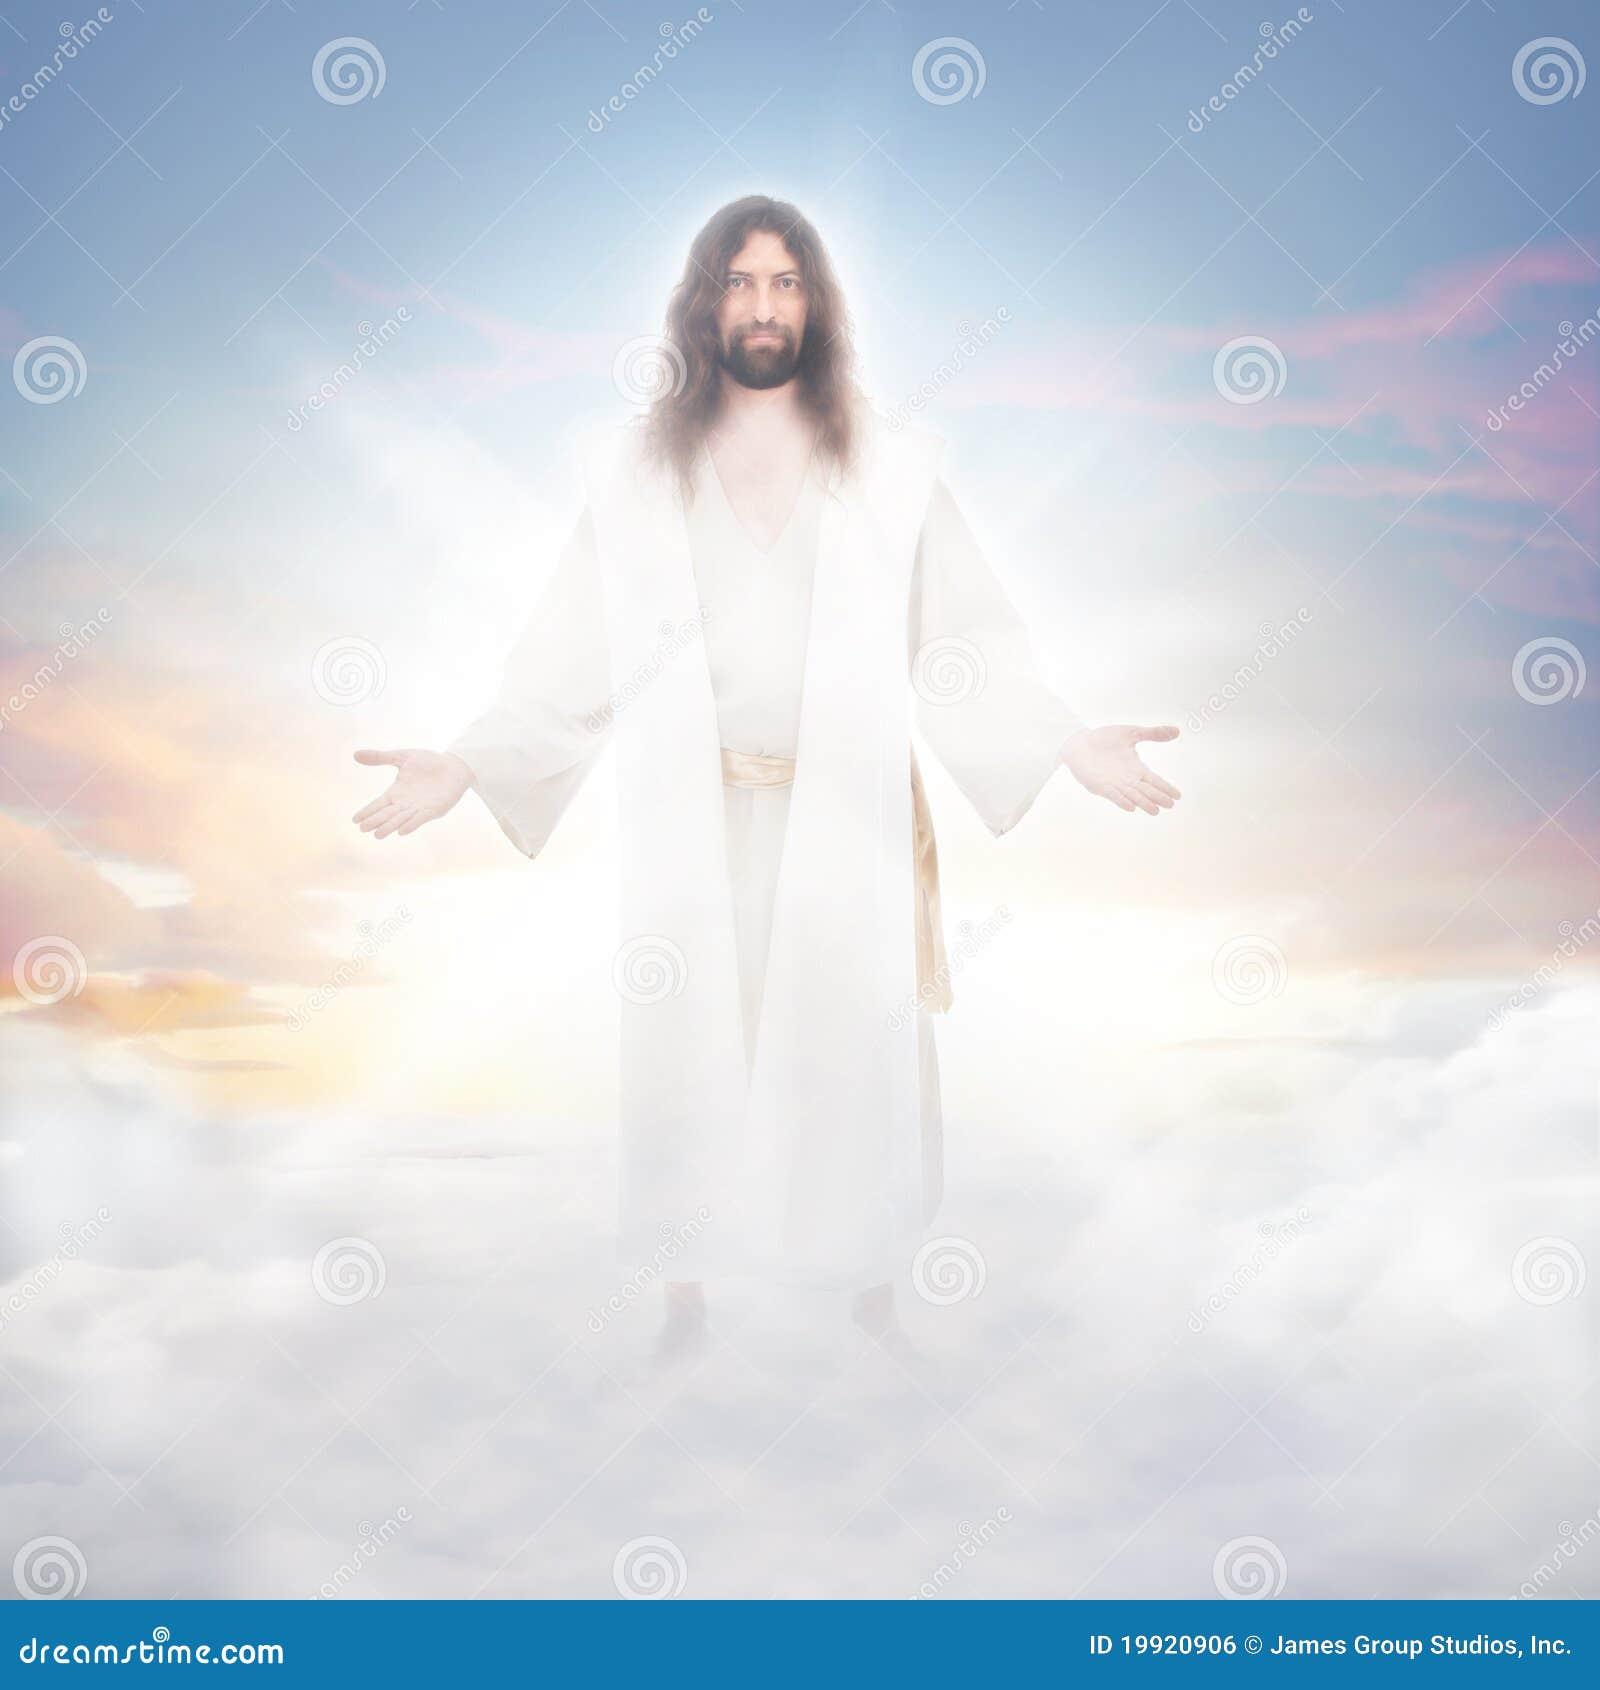 jesus stock photos images u0026 pictures 115 959 images